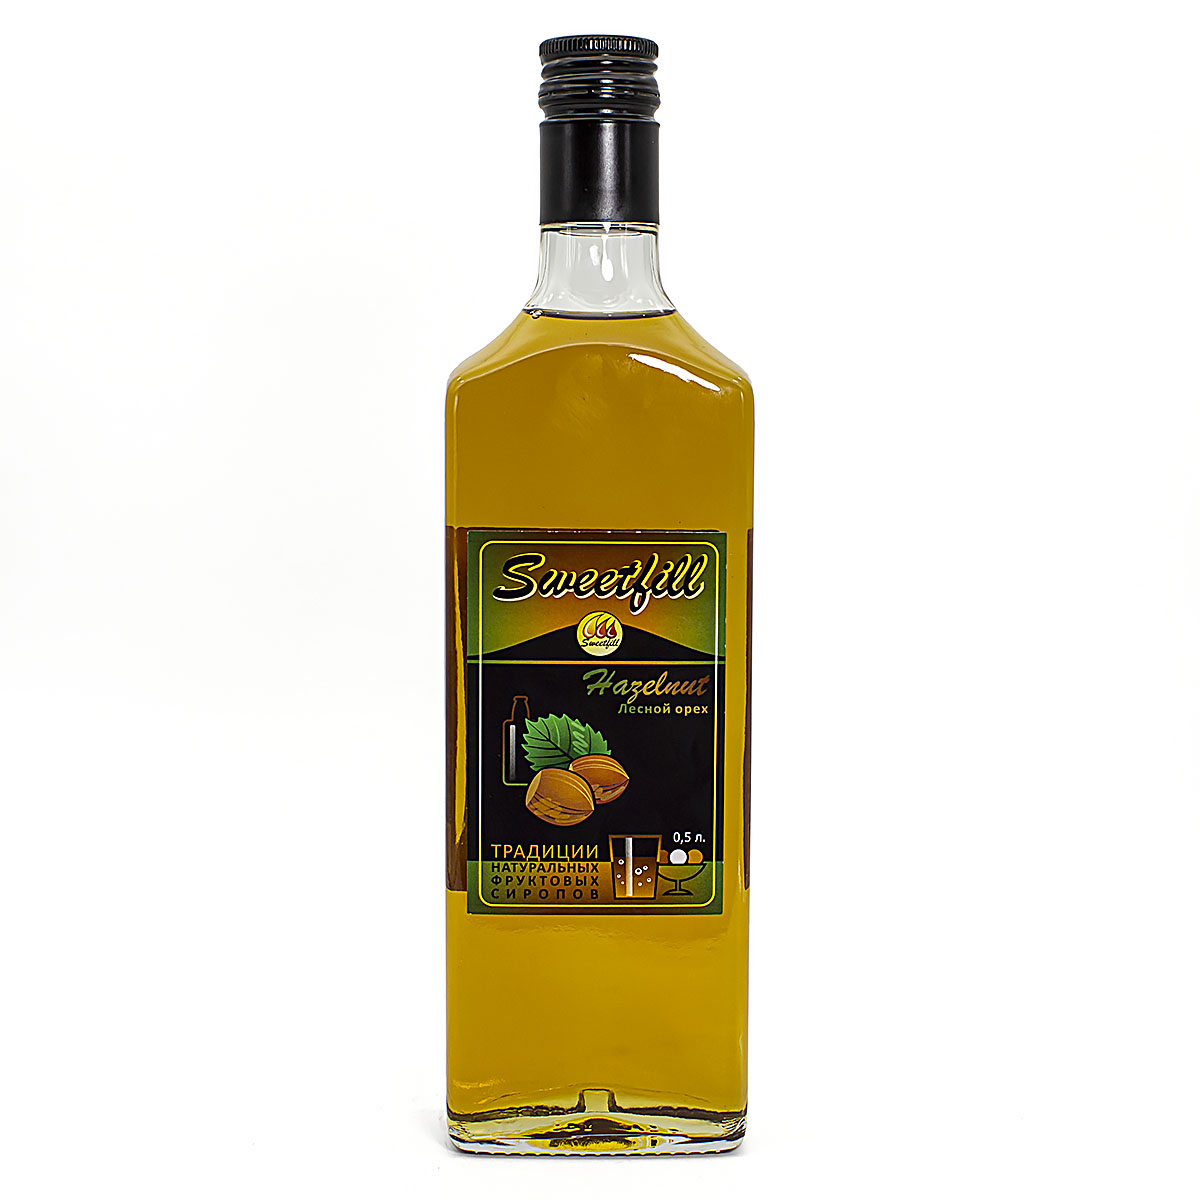 цены Сироп SweetFill Лесной орех, 0,5 л